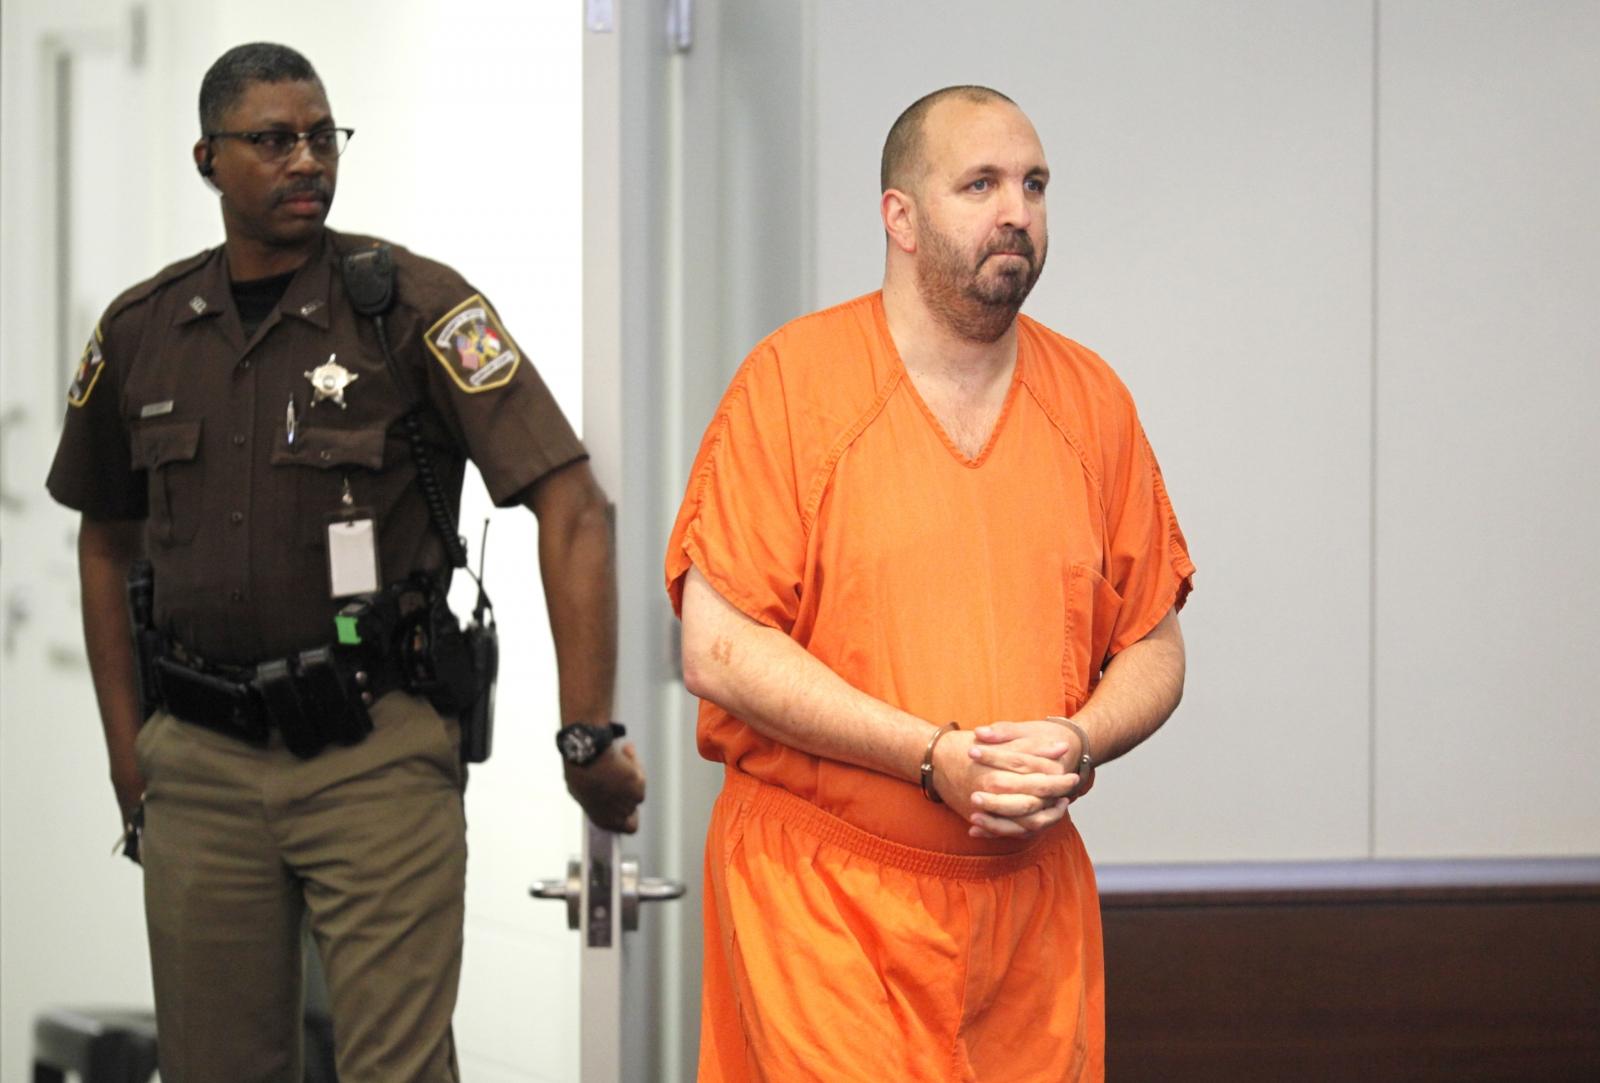 Craig Stephen Hicks faces death penalty